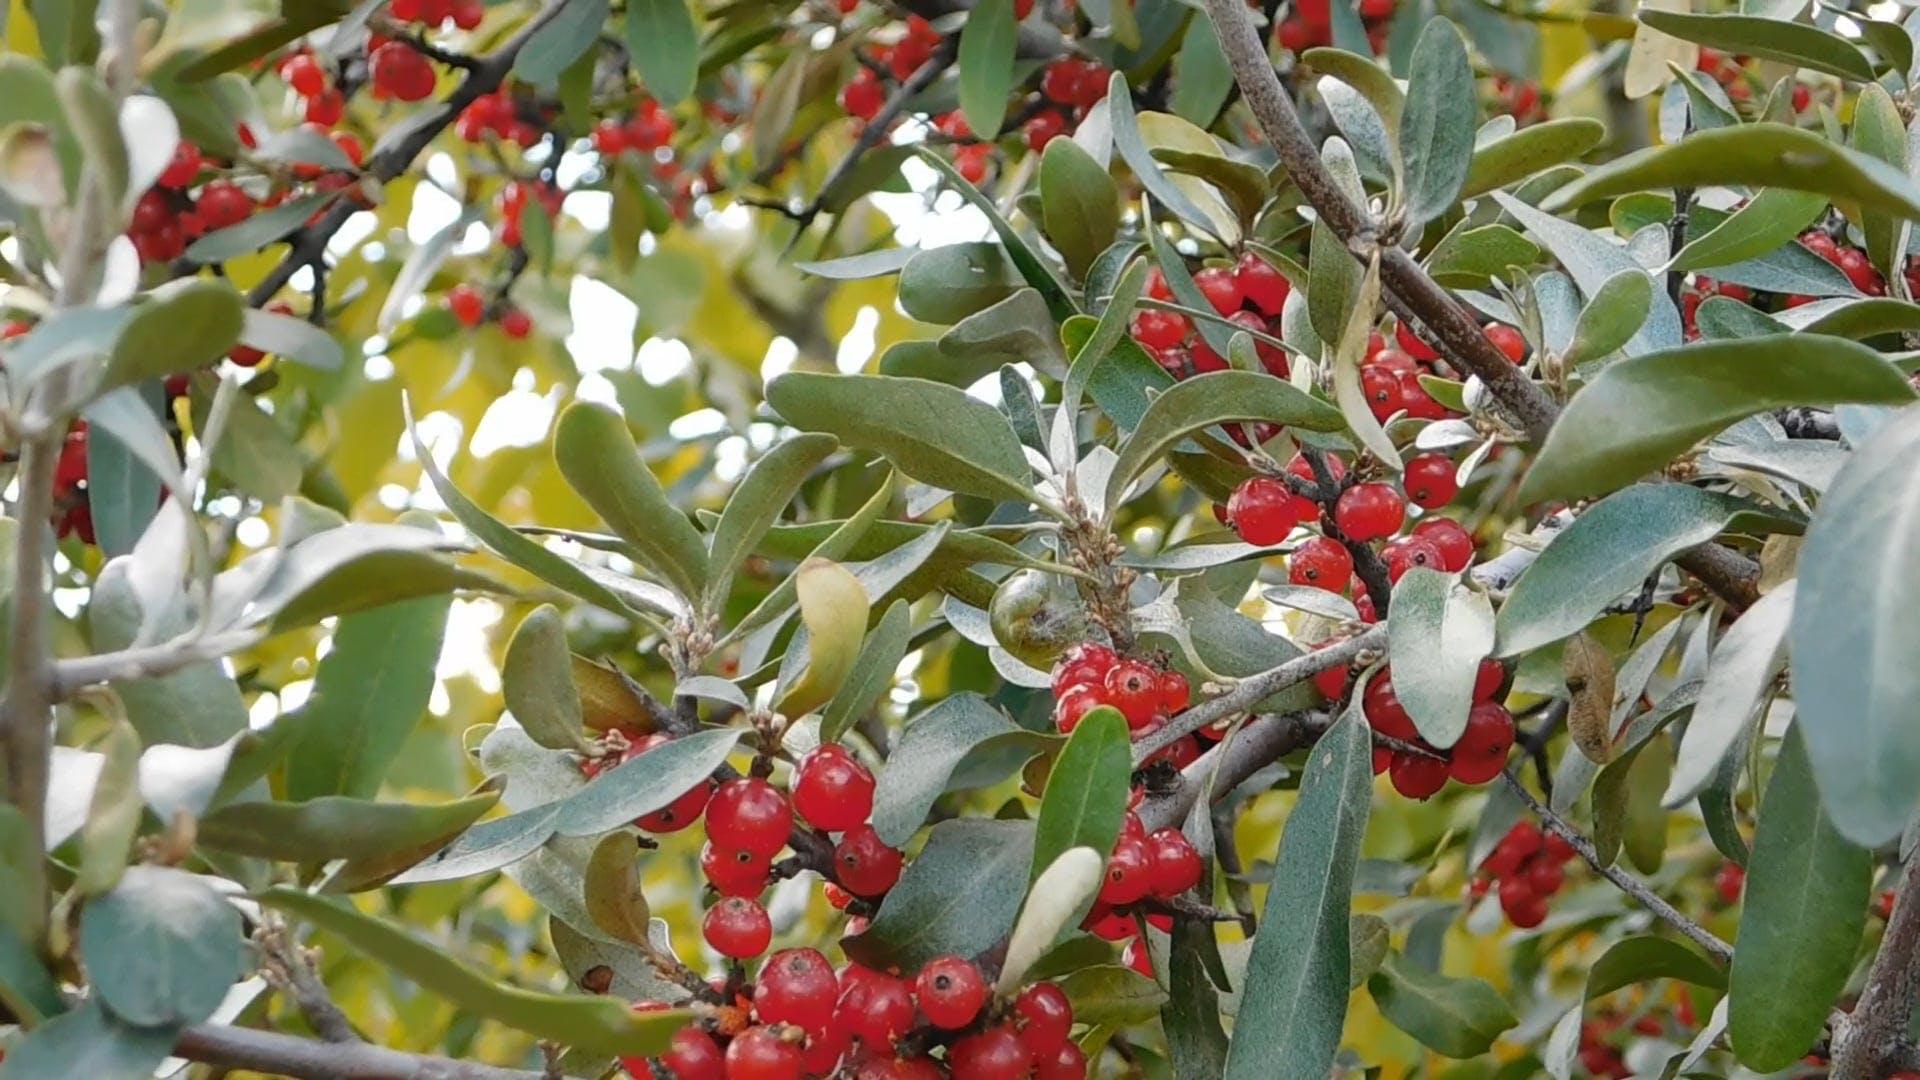 Alberta Sea Buckthorn Berries